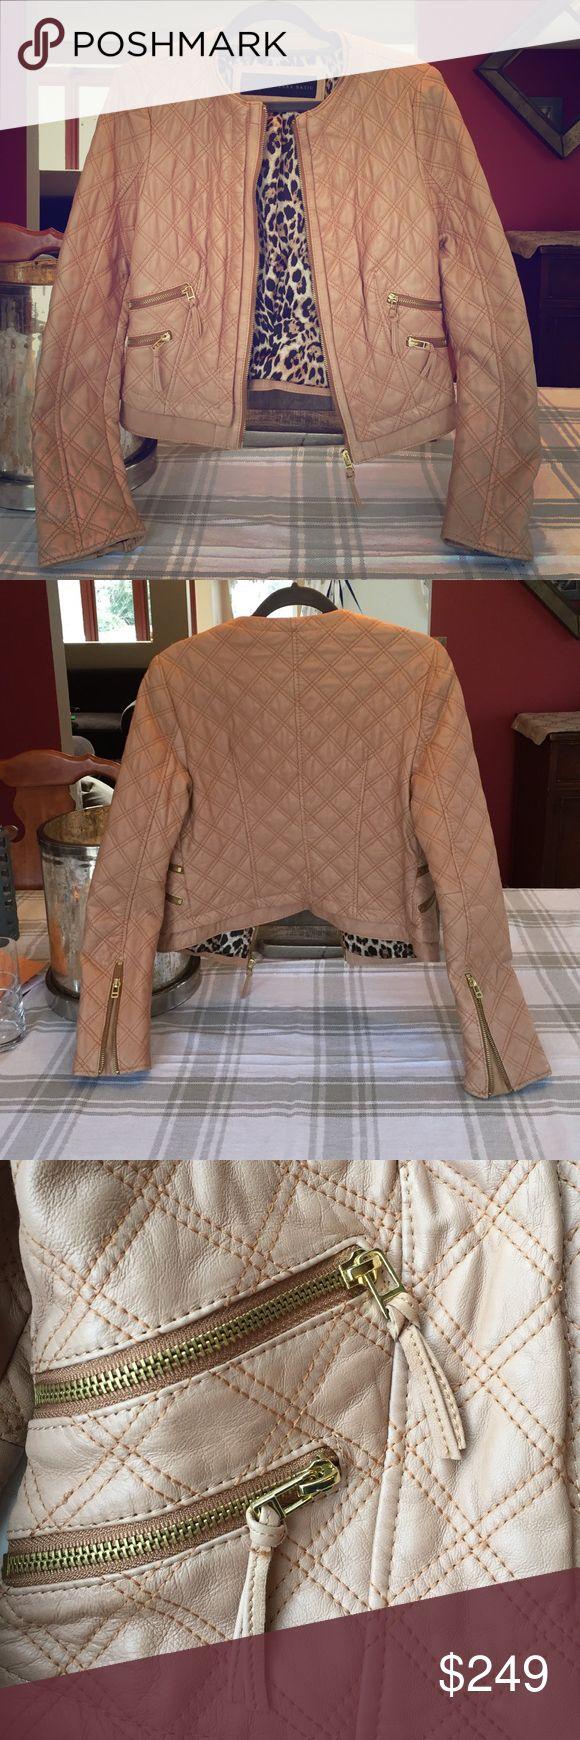 Zara lambskin leather jacket women's medium Extra soft lambskin Zara leather jacket never worn Zara Jackets & Coats